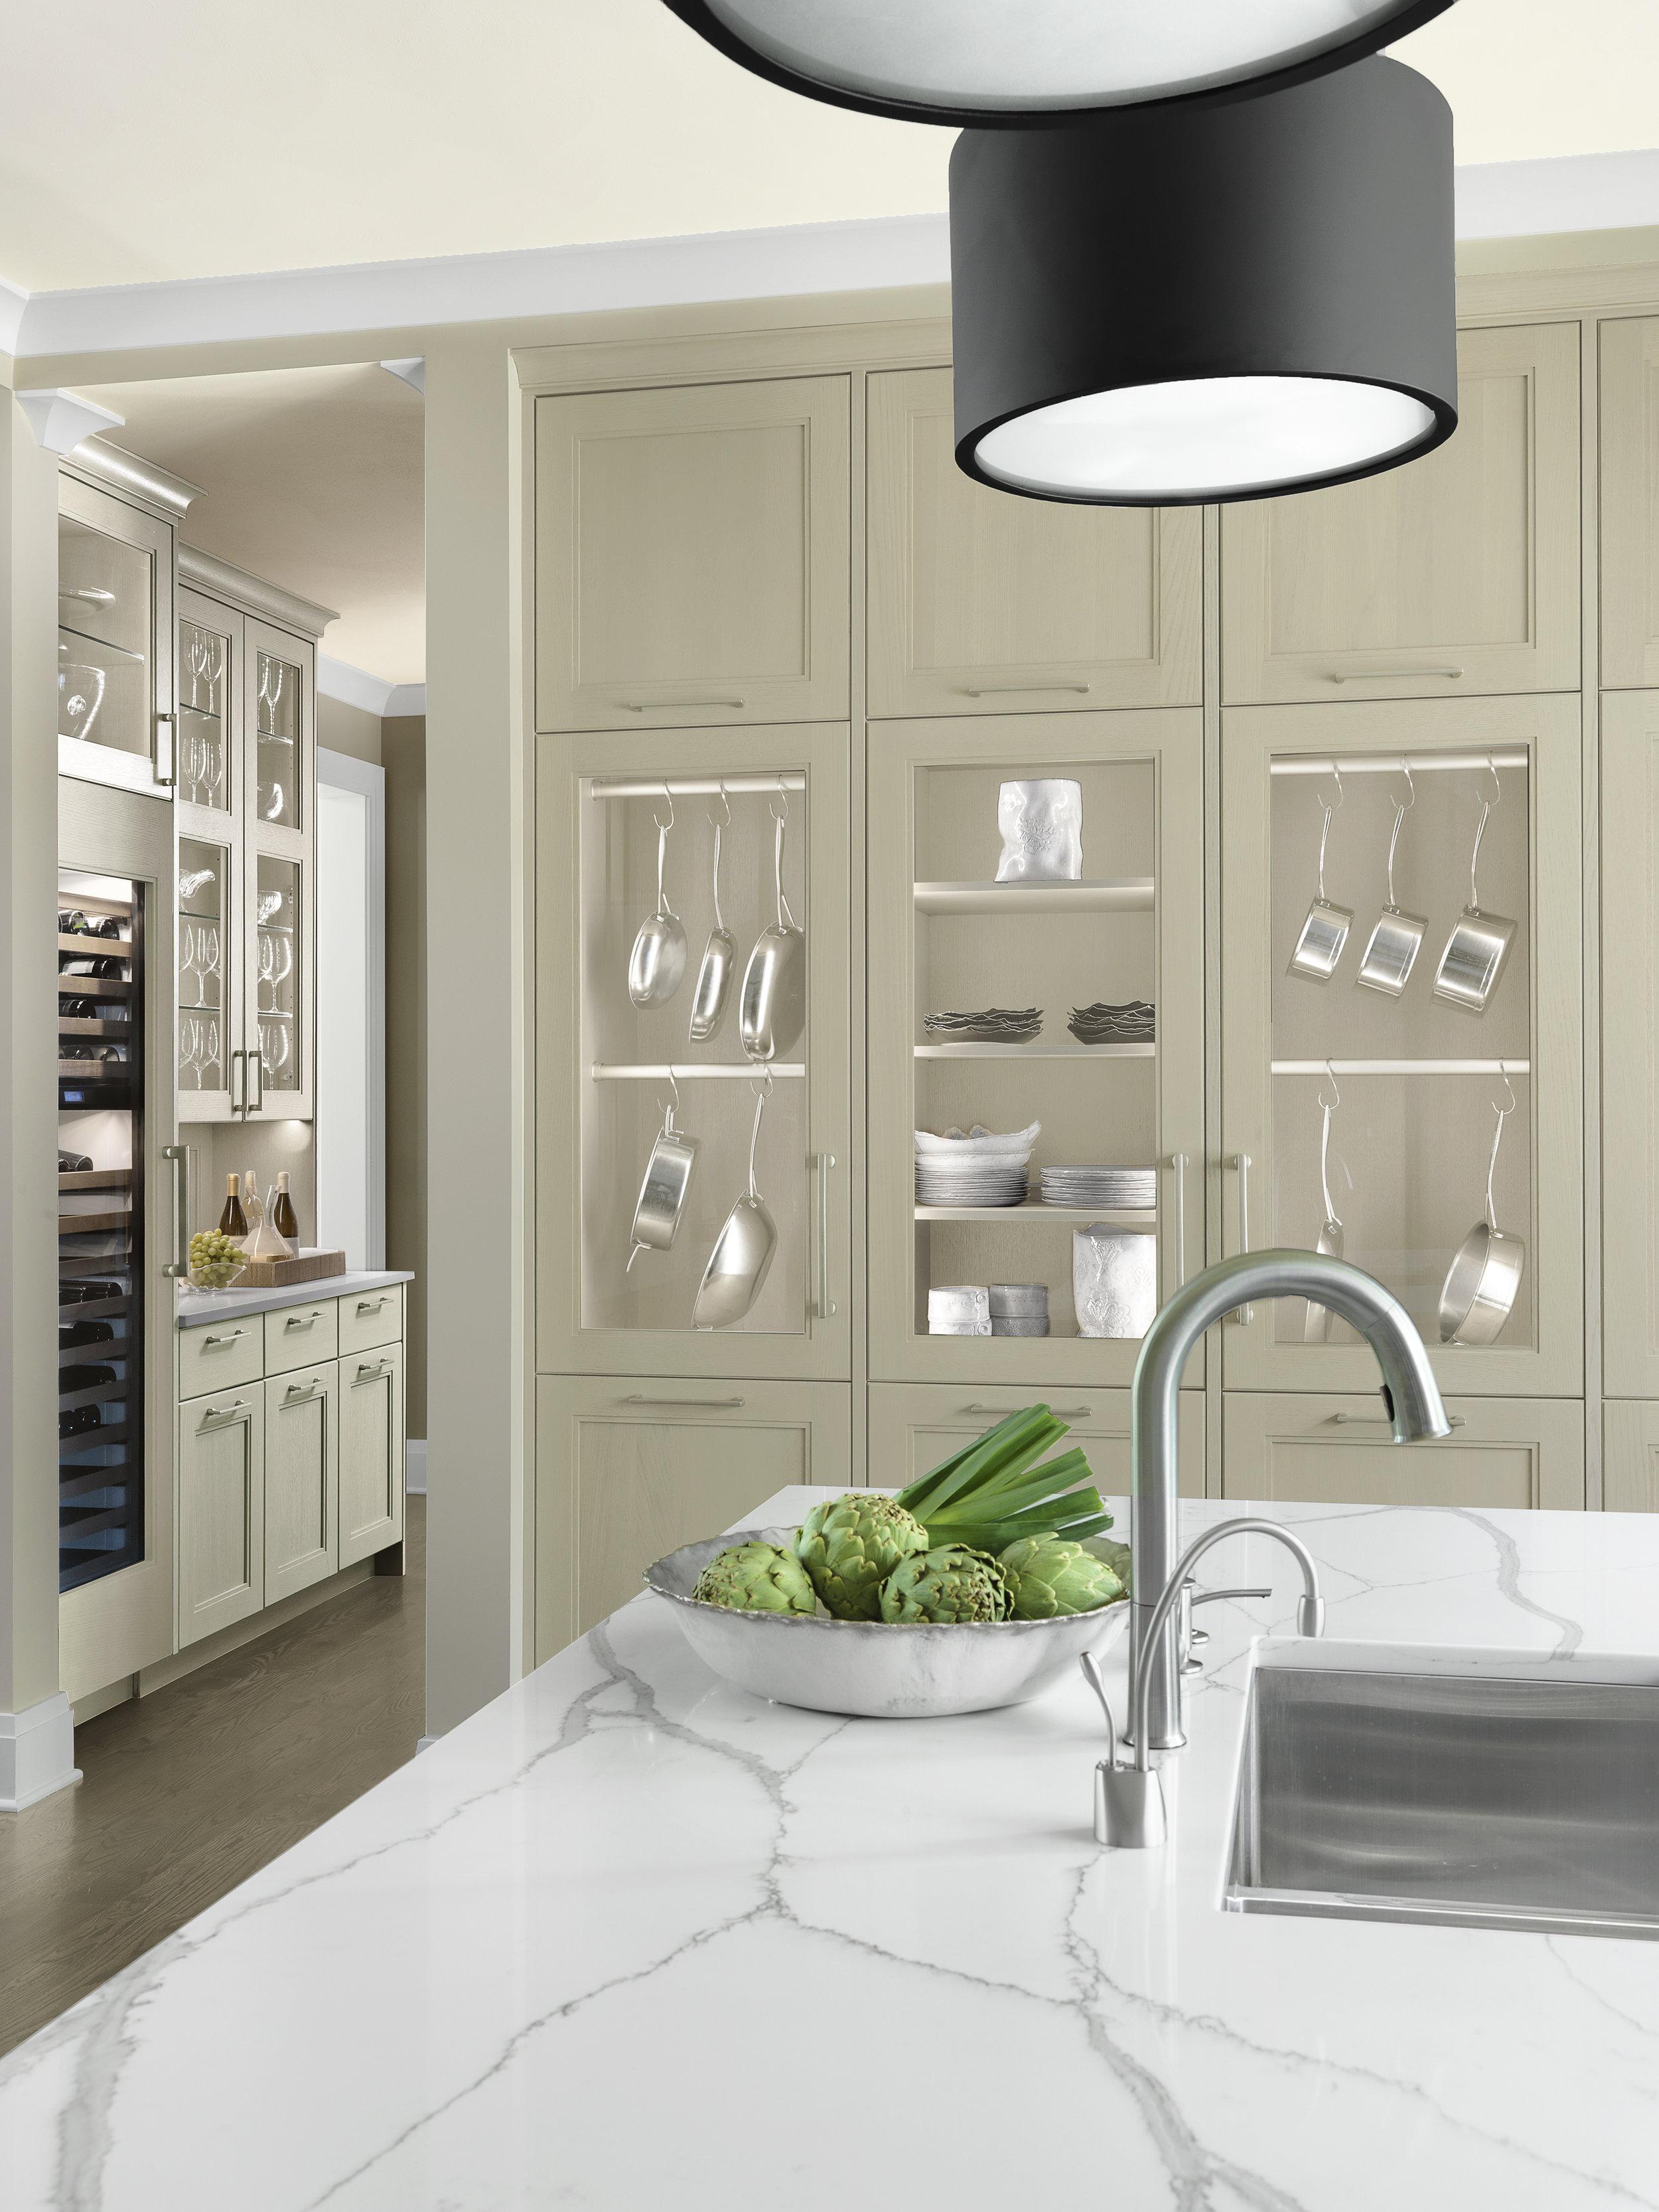 Kitchen Towards Butler.jpg